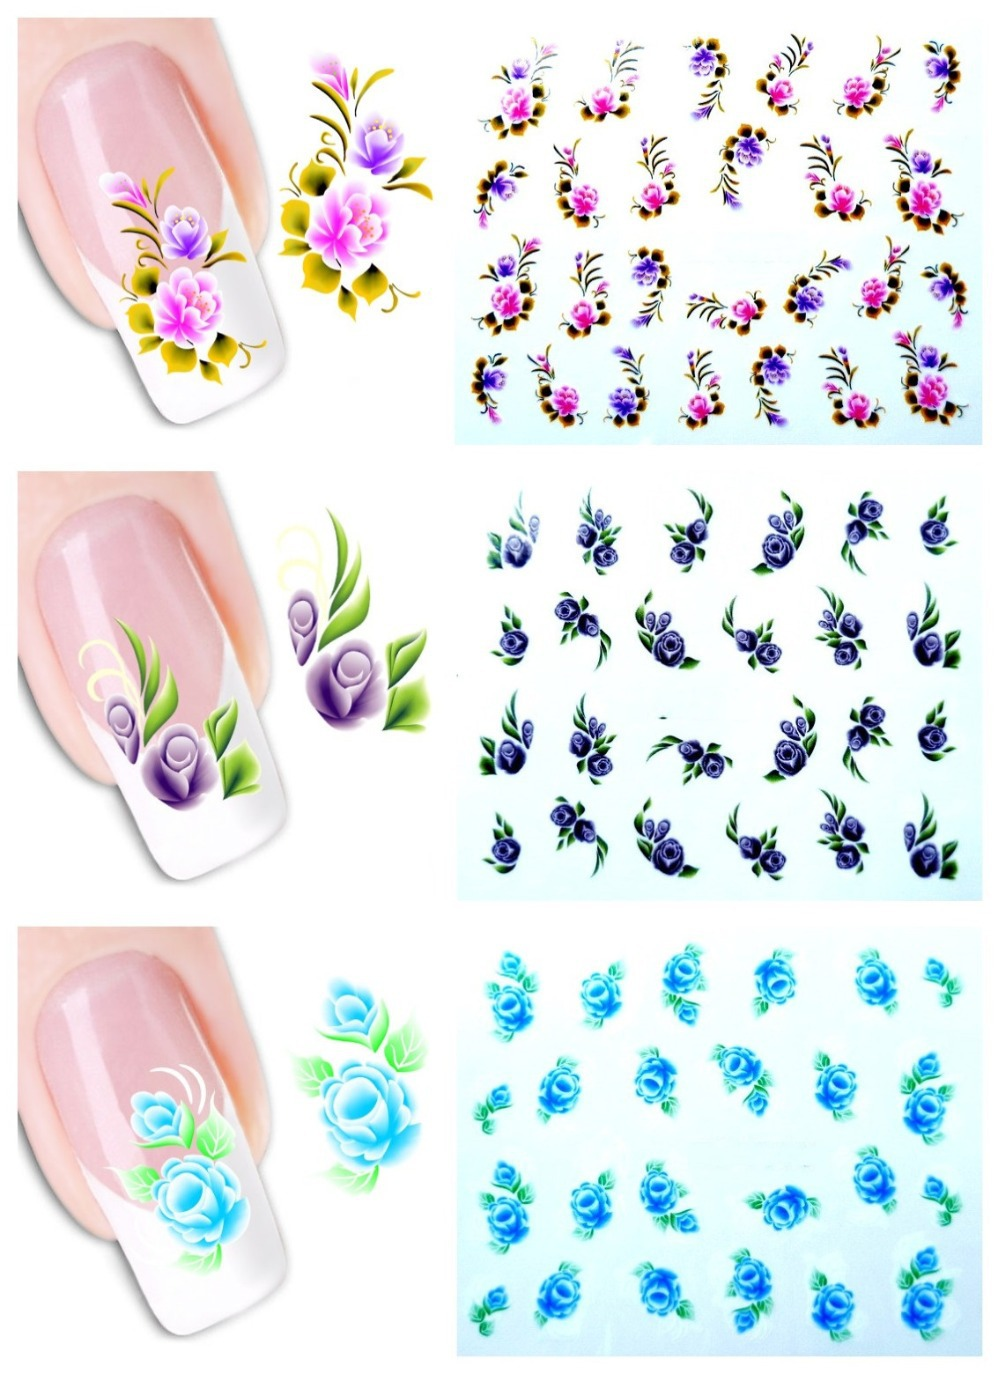 Бабочки на ногтях наклейки